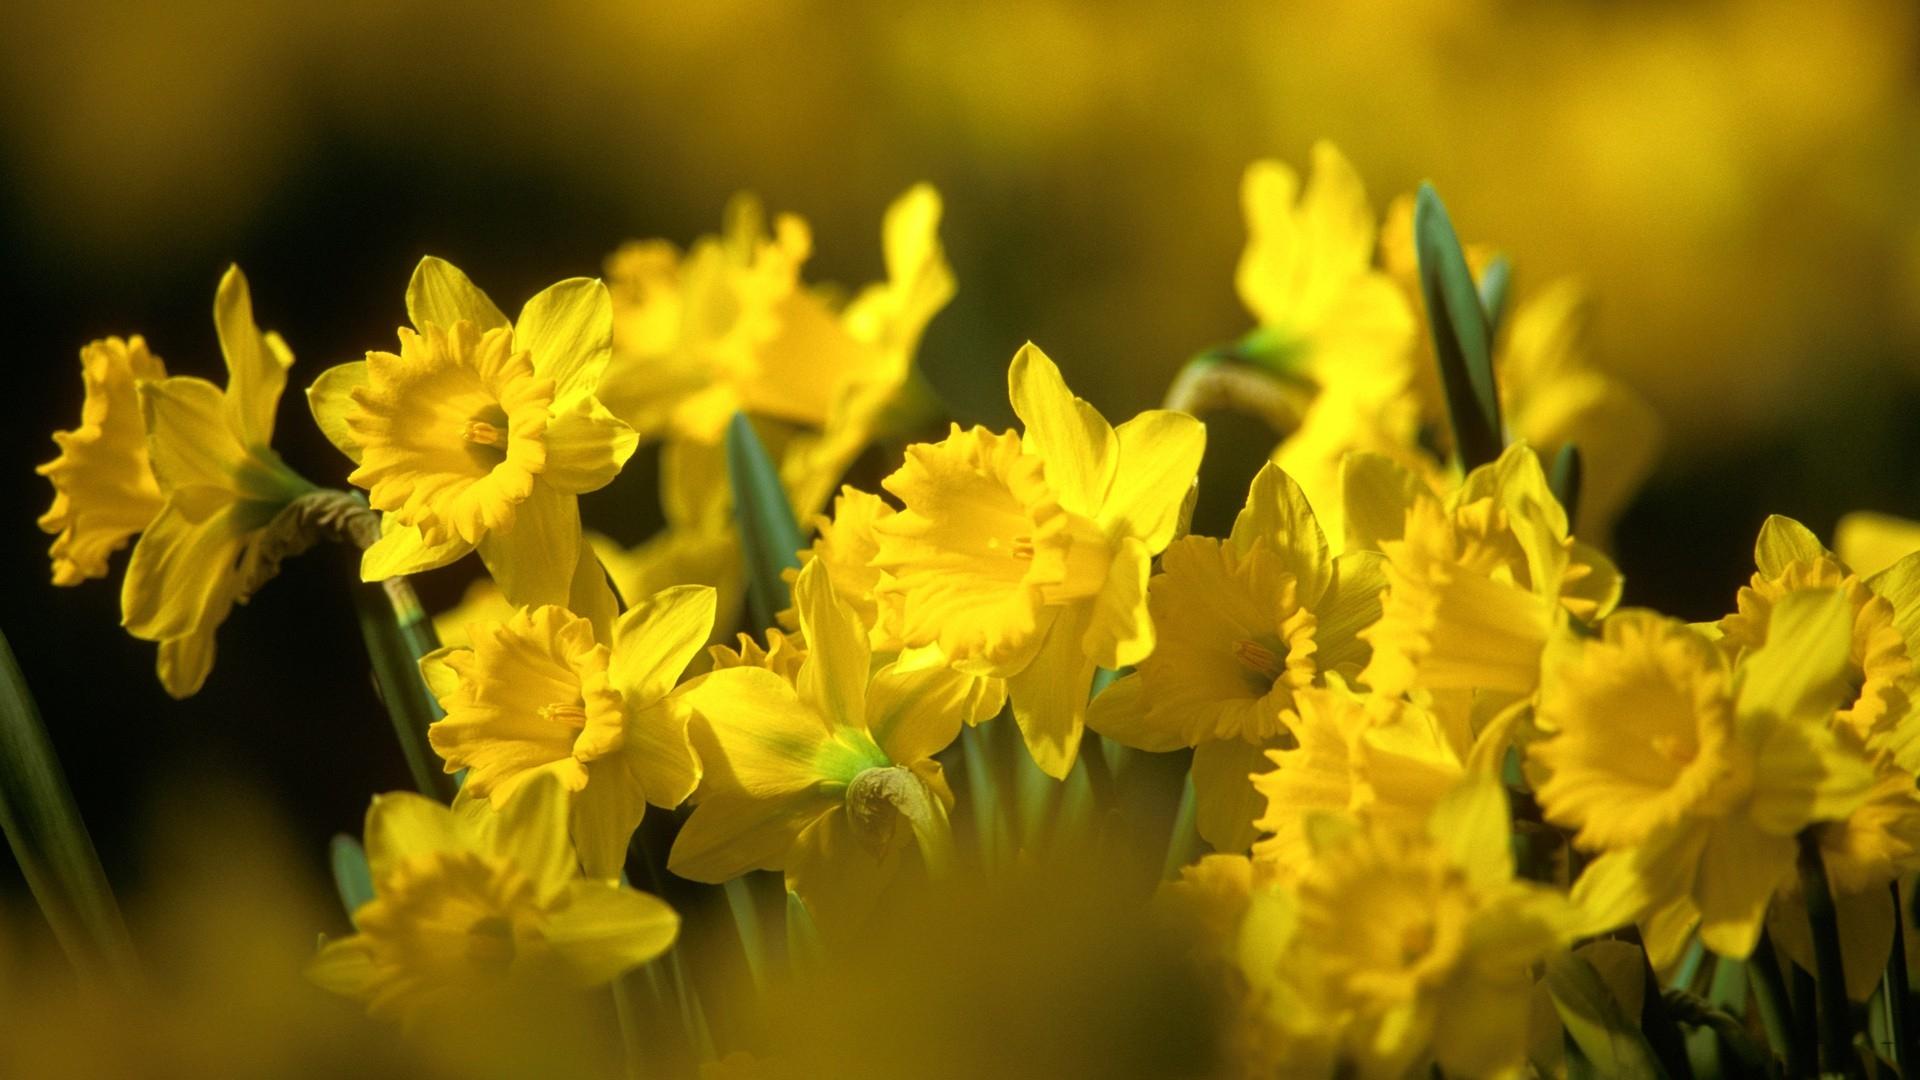 wallpaper : sunlight, flowers, nature, yellow, blurred, blossom